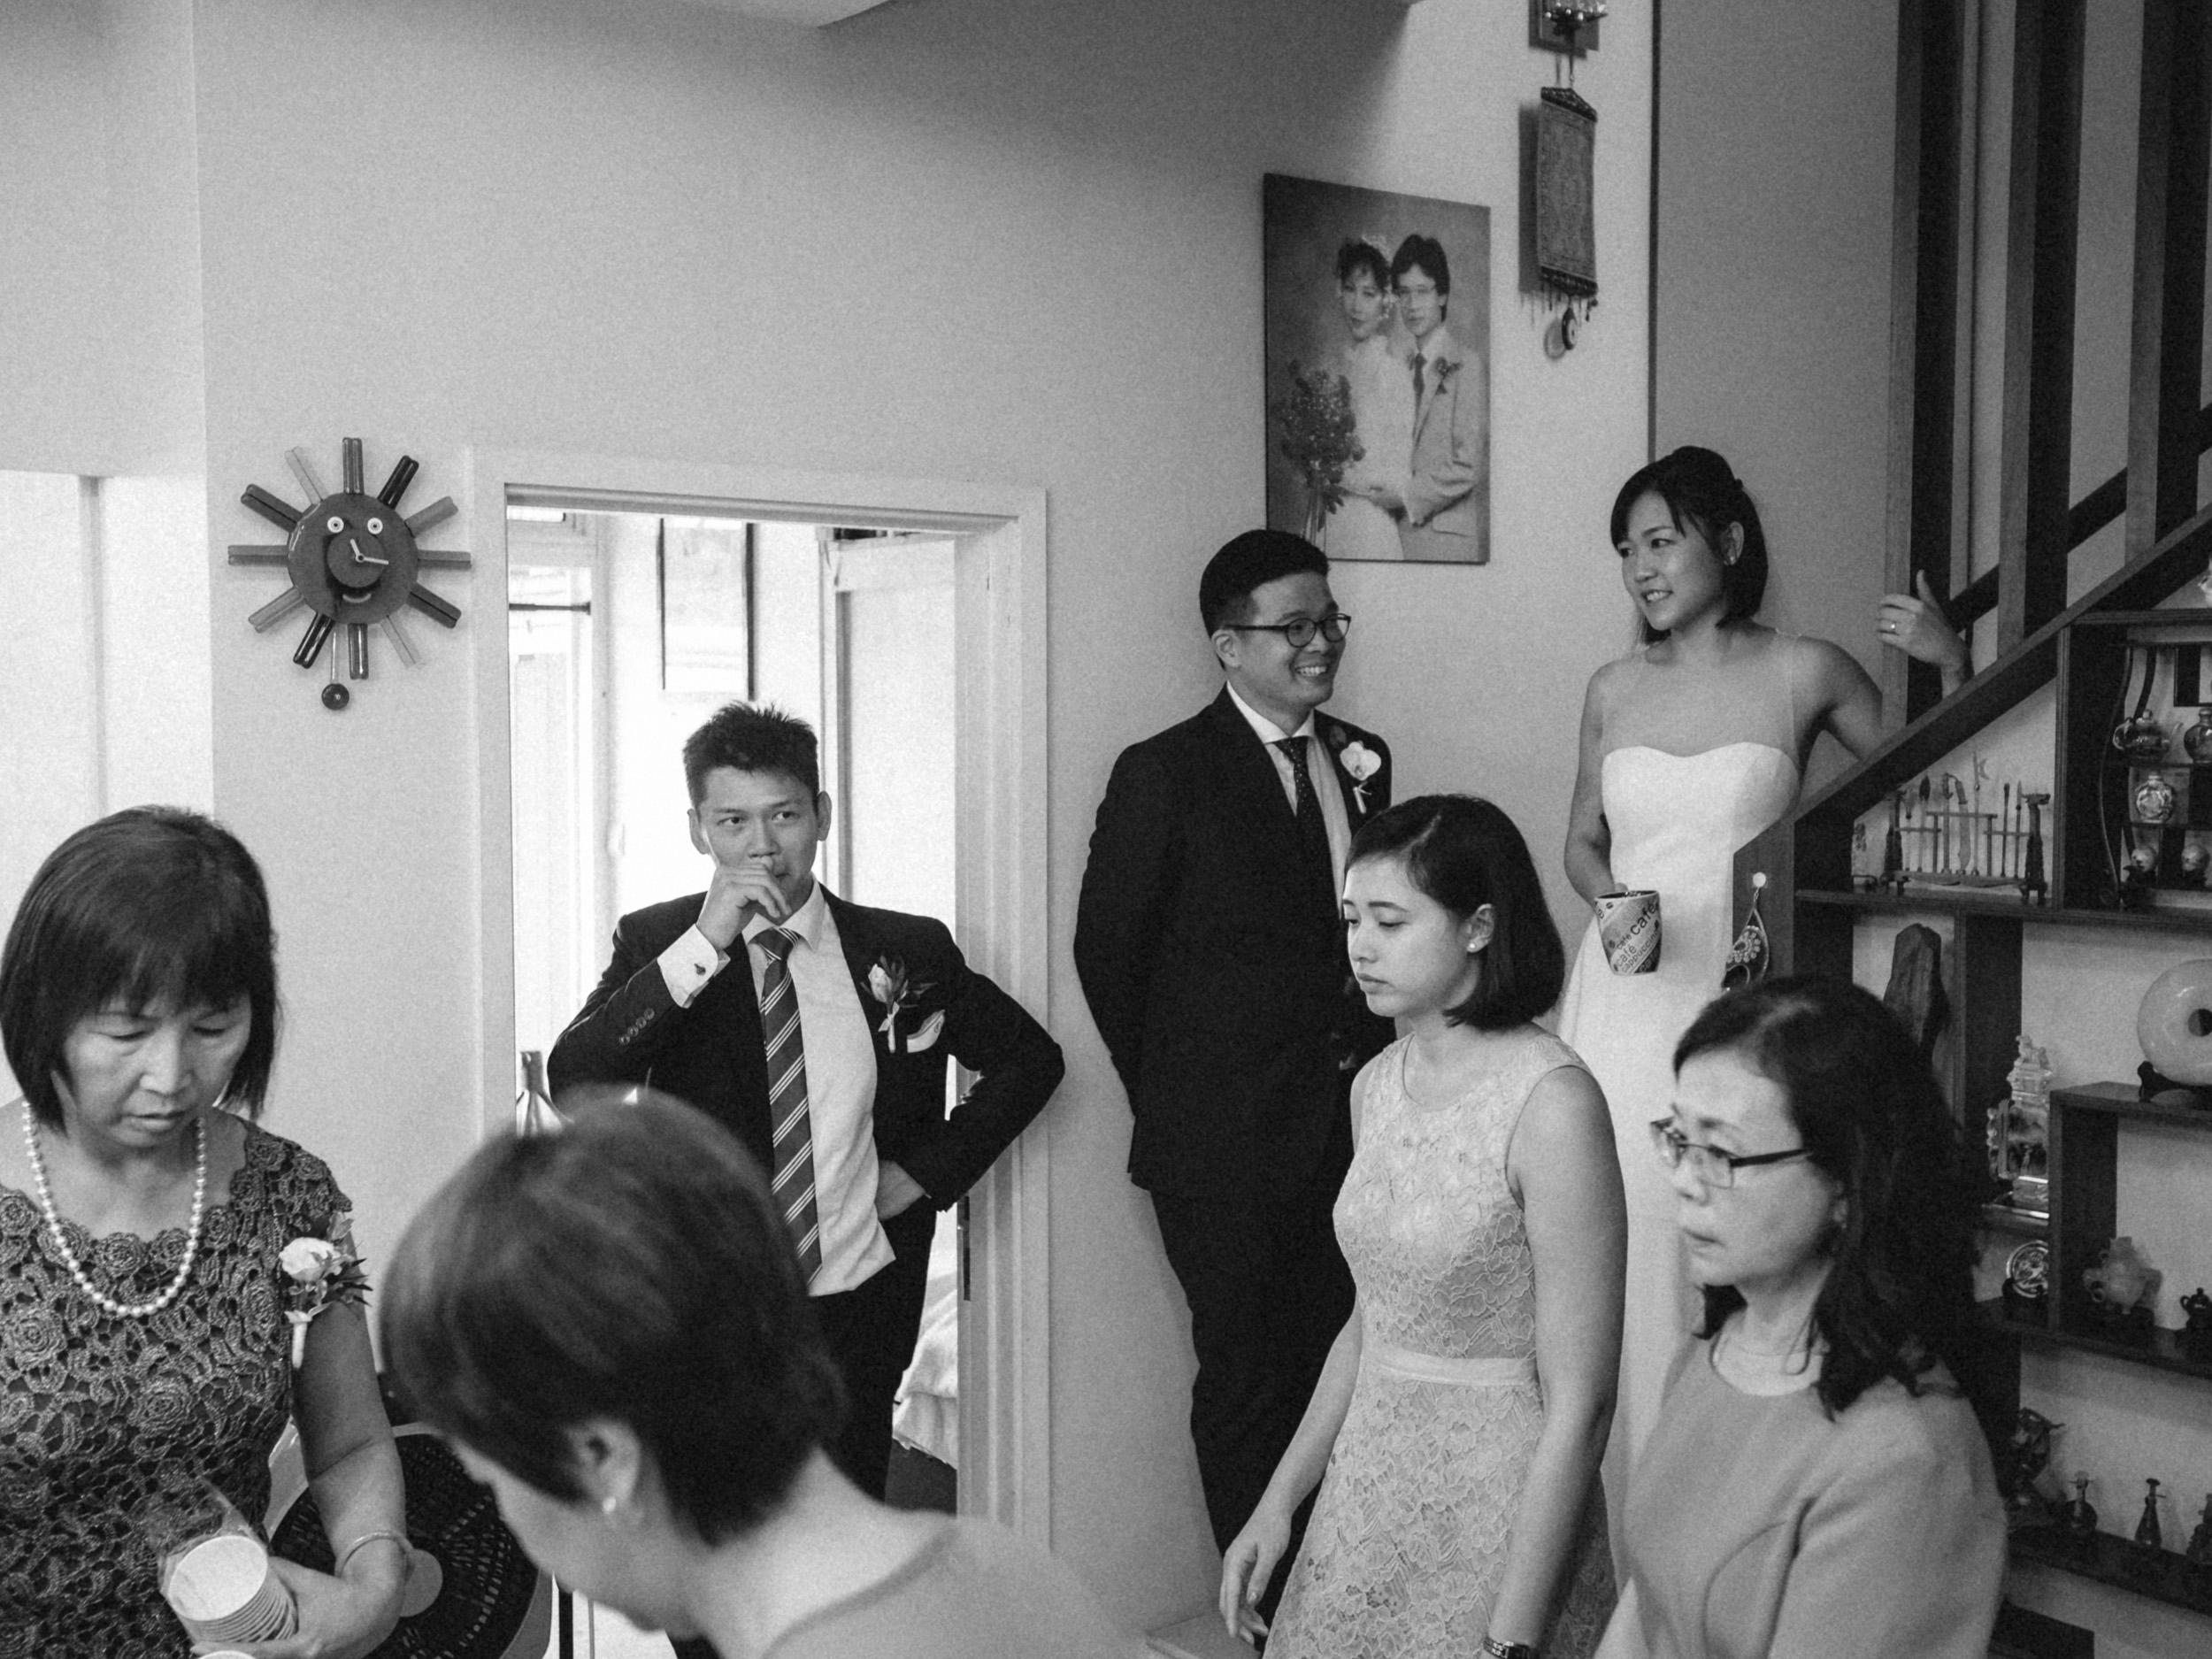 singapore-wedding-photographer-photography-wmt2017-056.jpg